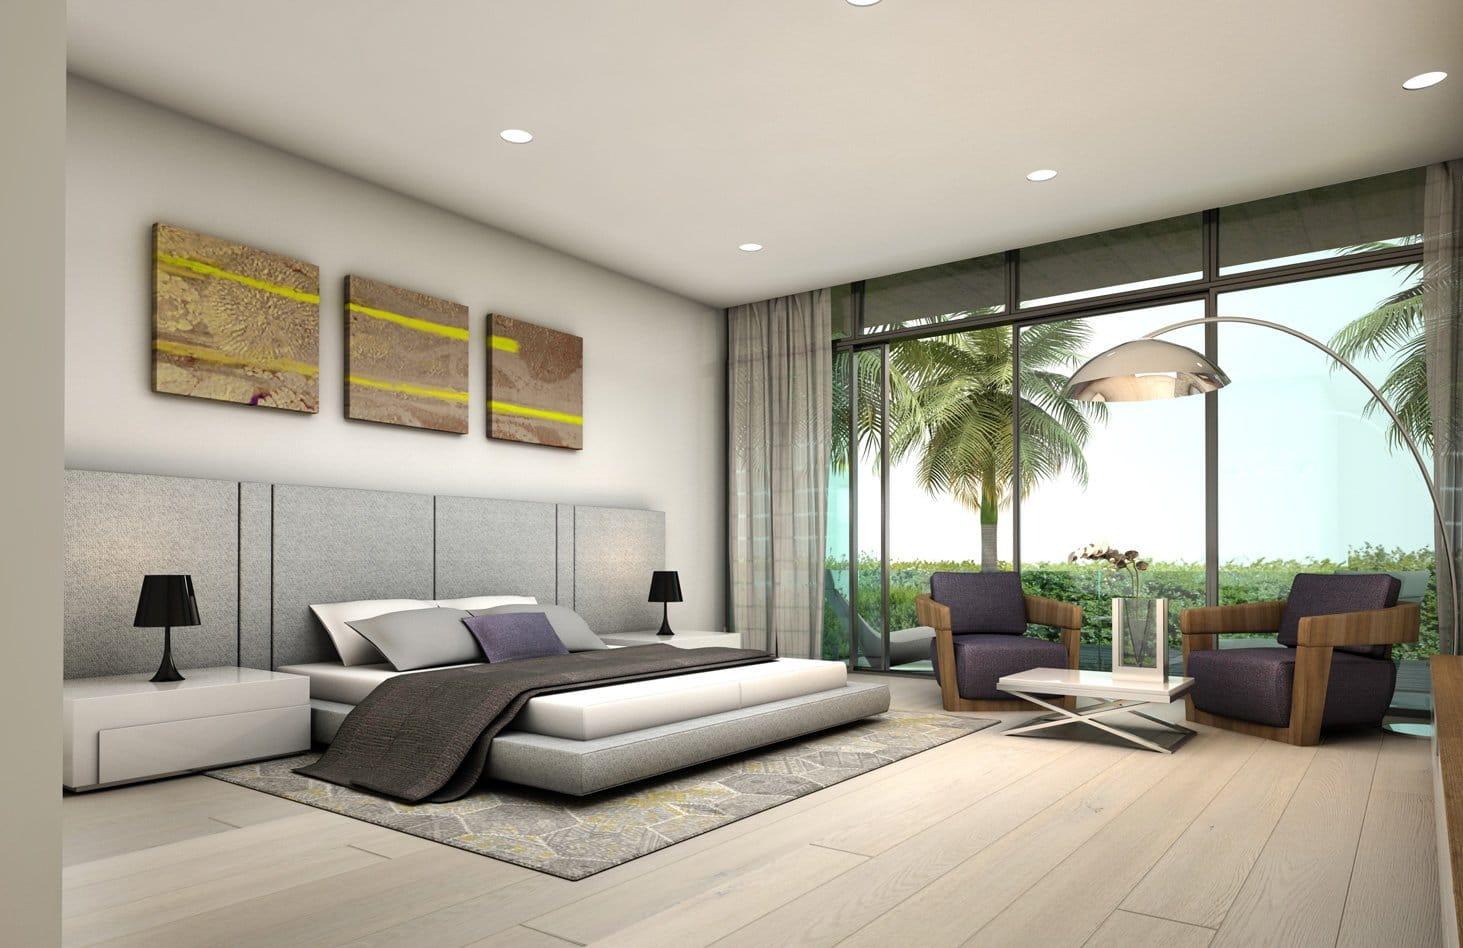 Interior Design bedroom view project in 65 Bal Harbour, Florida